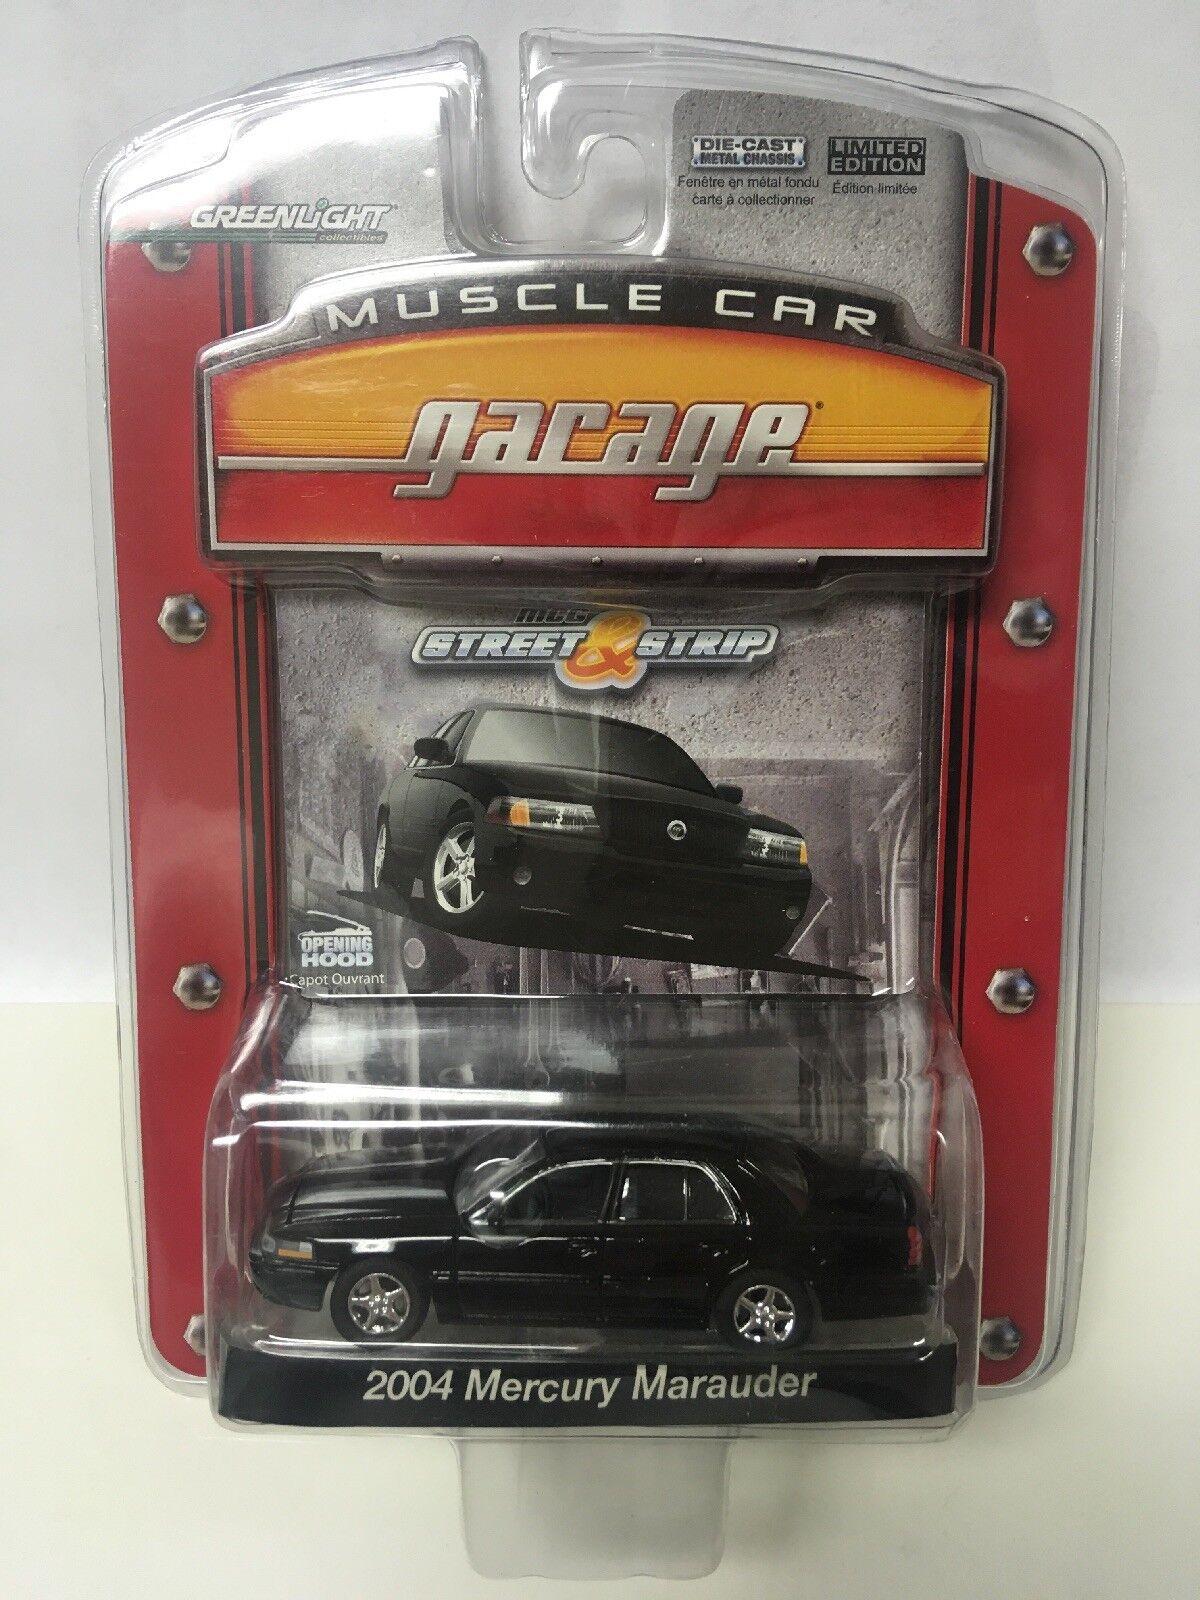 verdelight mcg Muscle Car Garage nero 2004 Mercury Marauder 1 64 escala Diecast